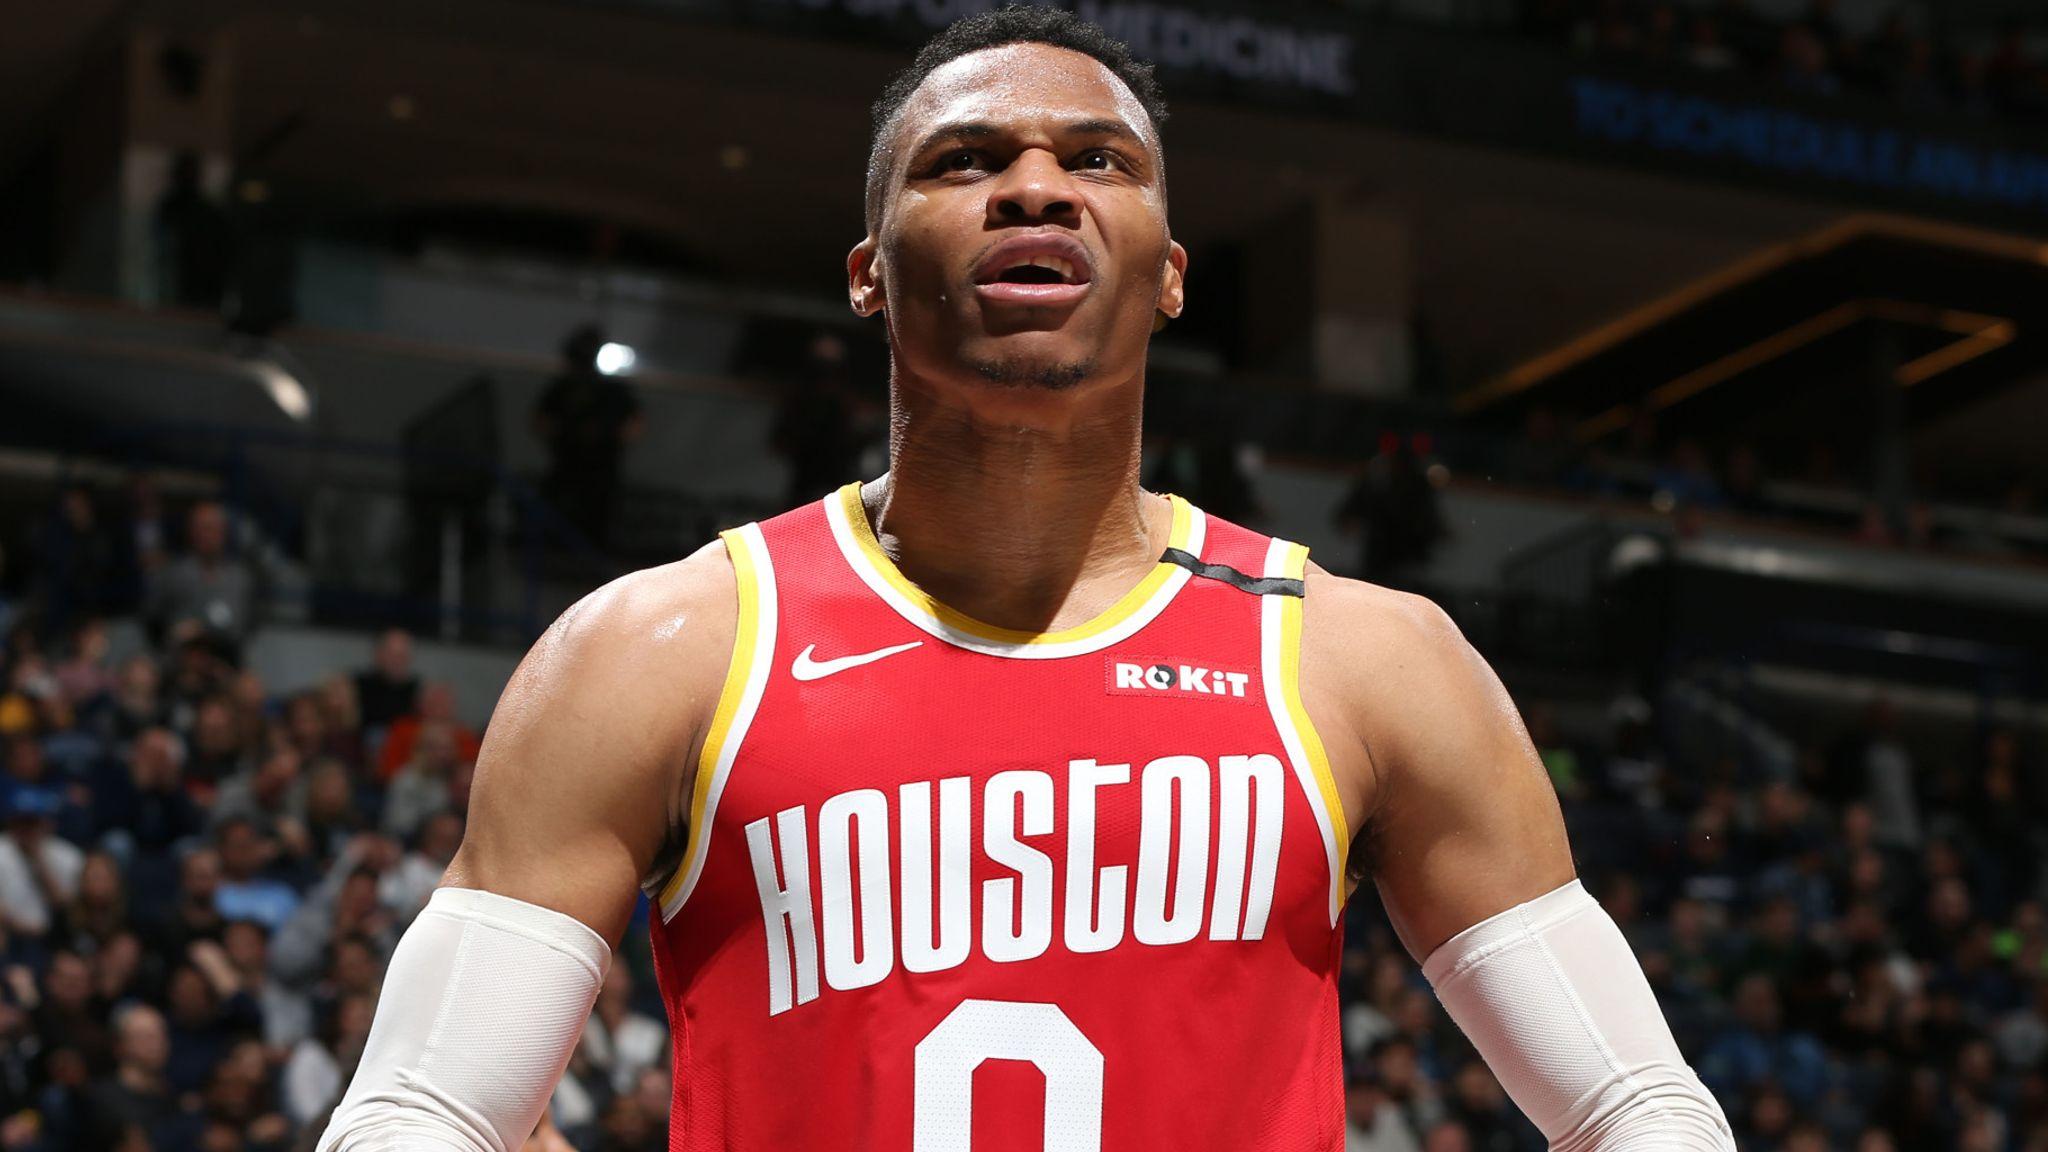 Russell Westbrook: 'MVP Russ' drops season-high 45 against Minnesota Timberwolves to offset James Harden slump